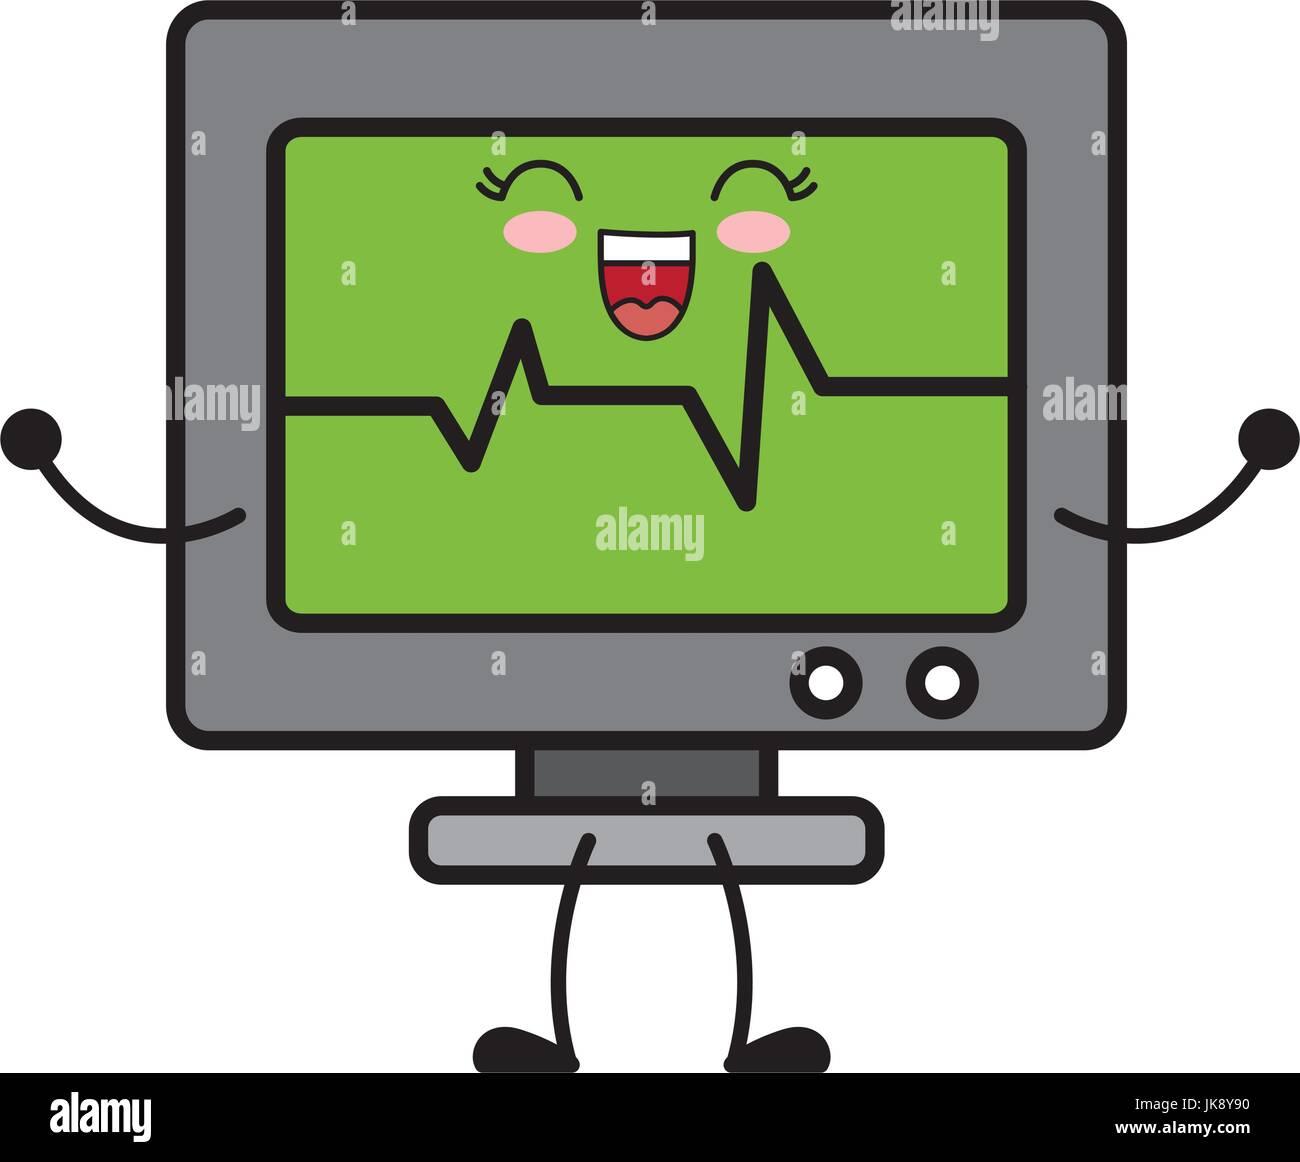 heart cardio monitor icon - Stock Image